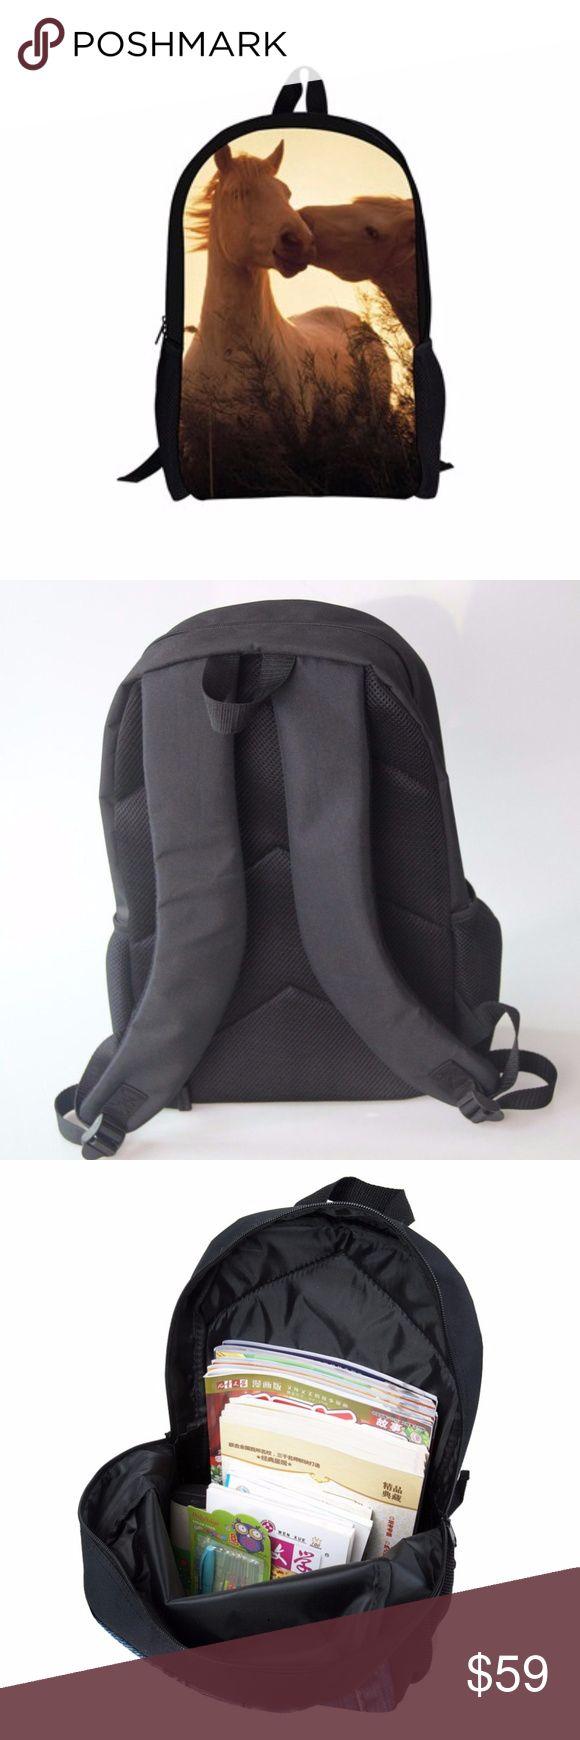 Children backpack for school all new backpack for school Bags Backpacks